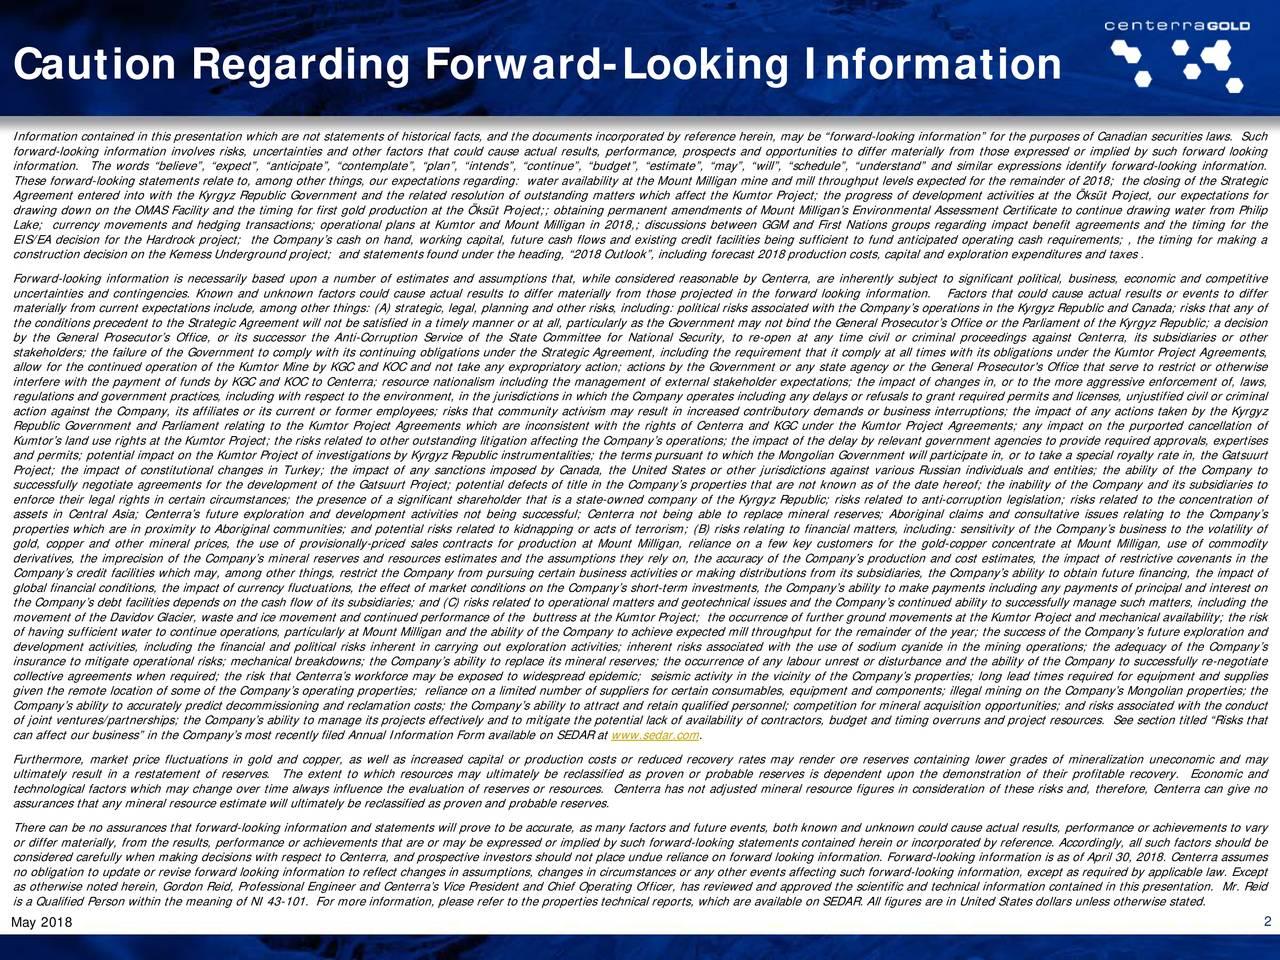 Caution Regarding Forward-Looking Information